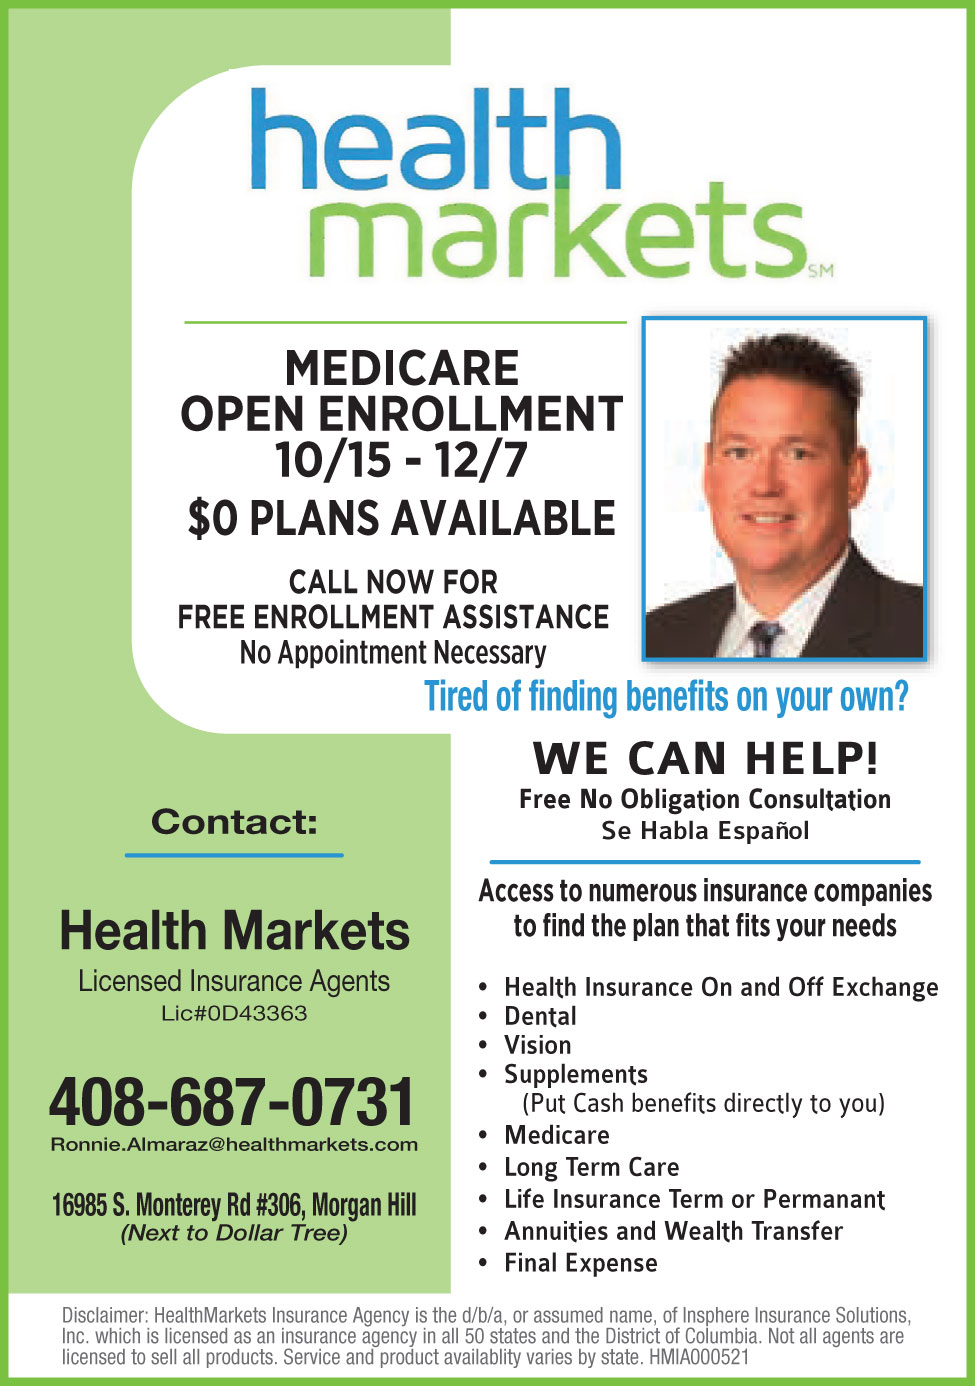 Health Markets - Licensed Insurance Agents - Morgan Hill Life